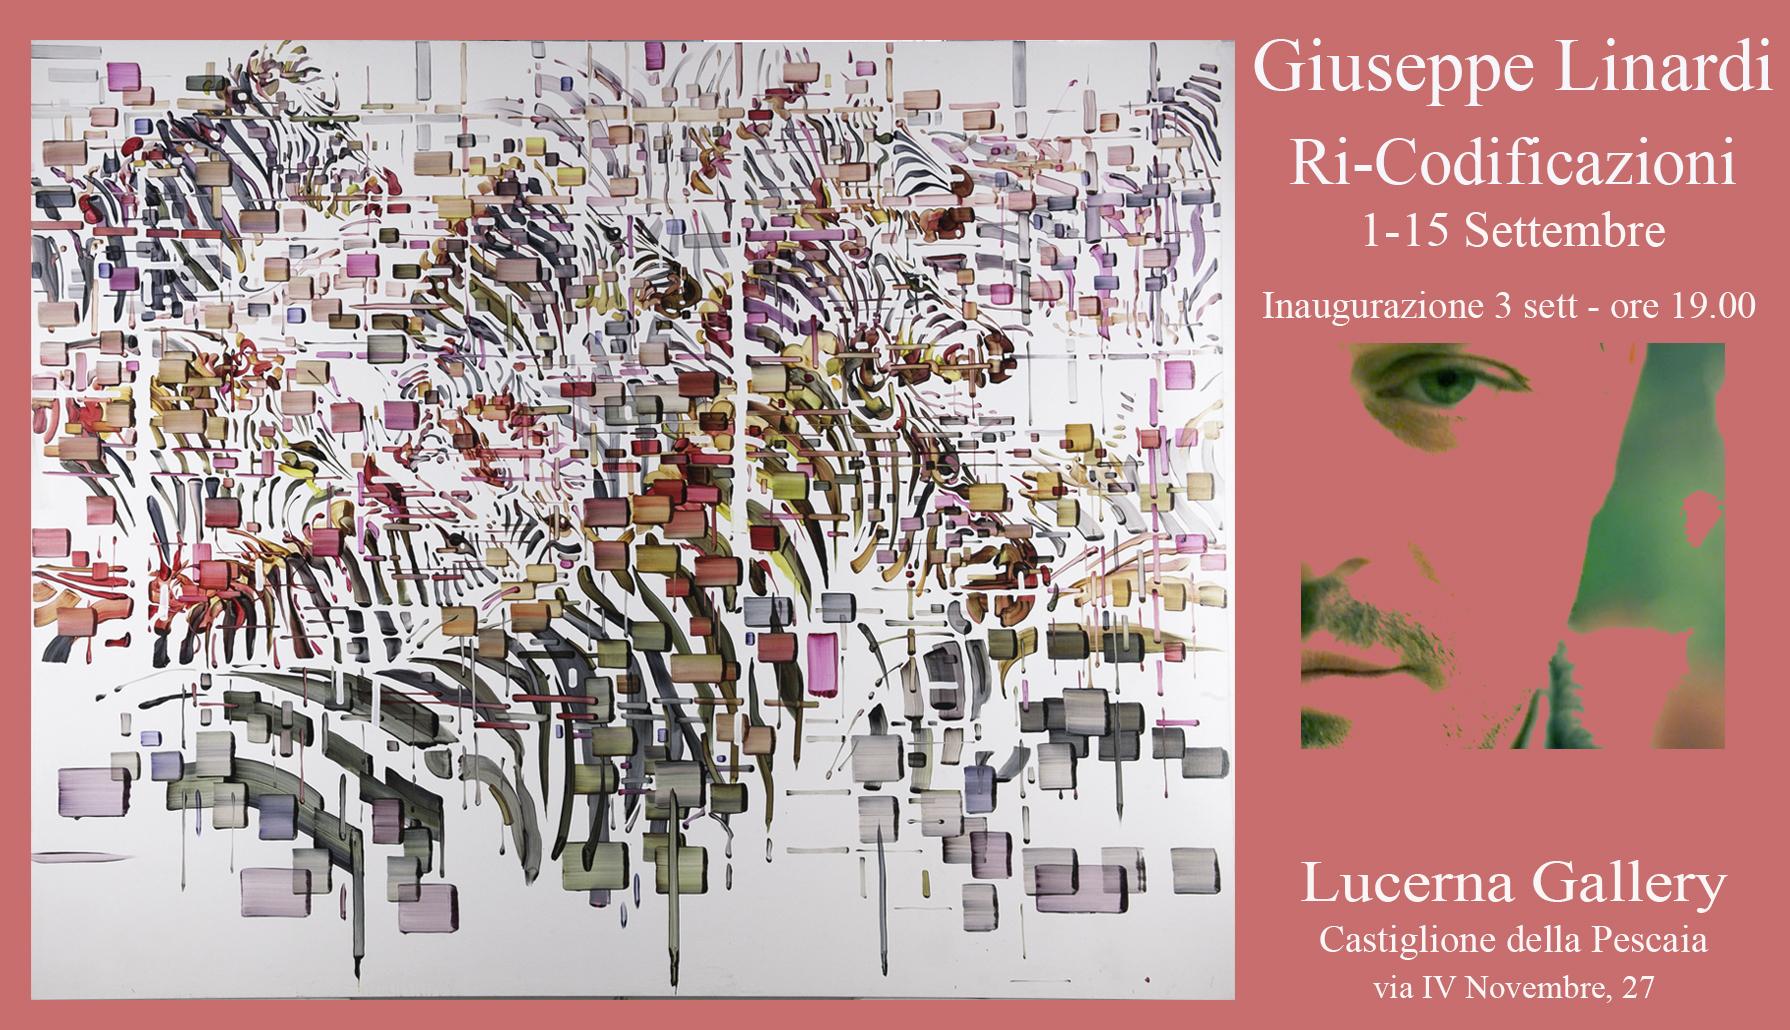 manifesto-mostra-giuseppe-linardi